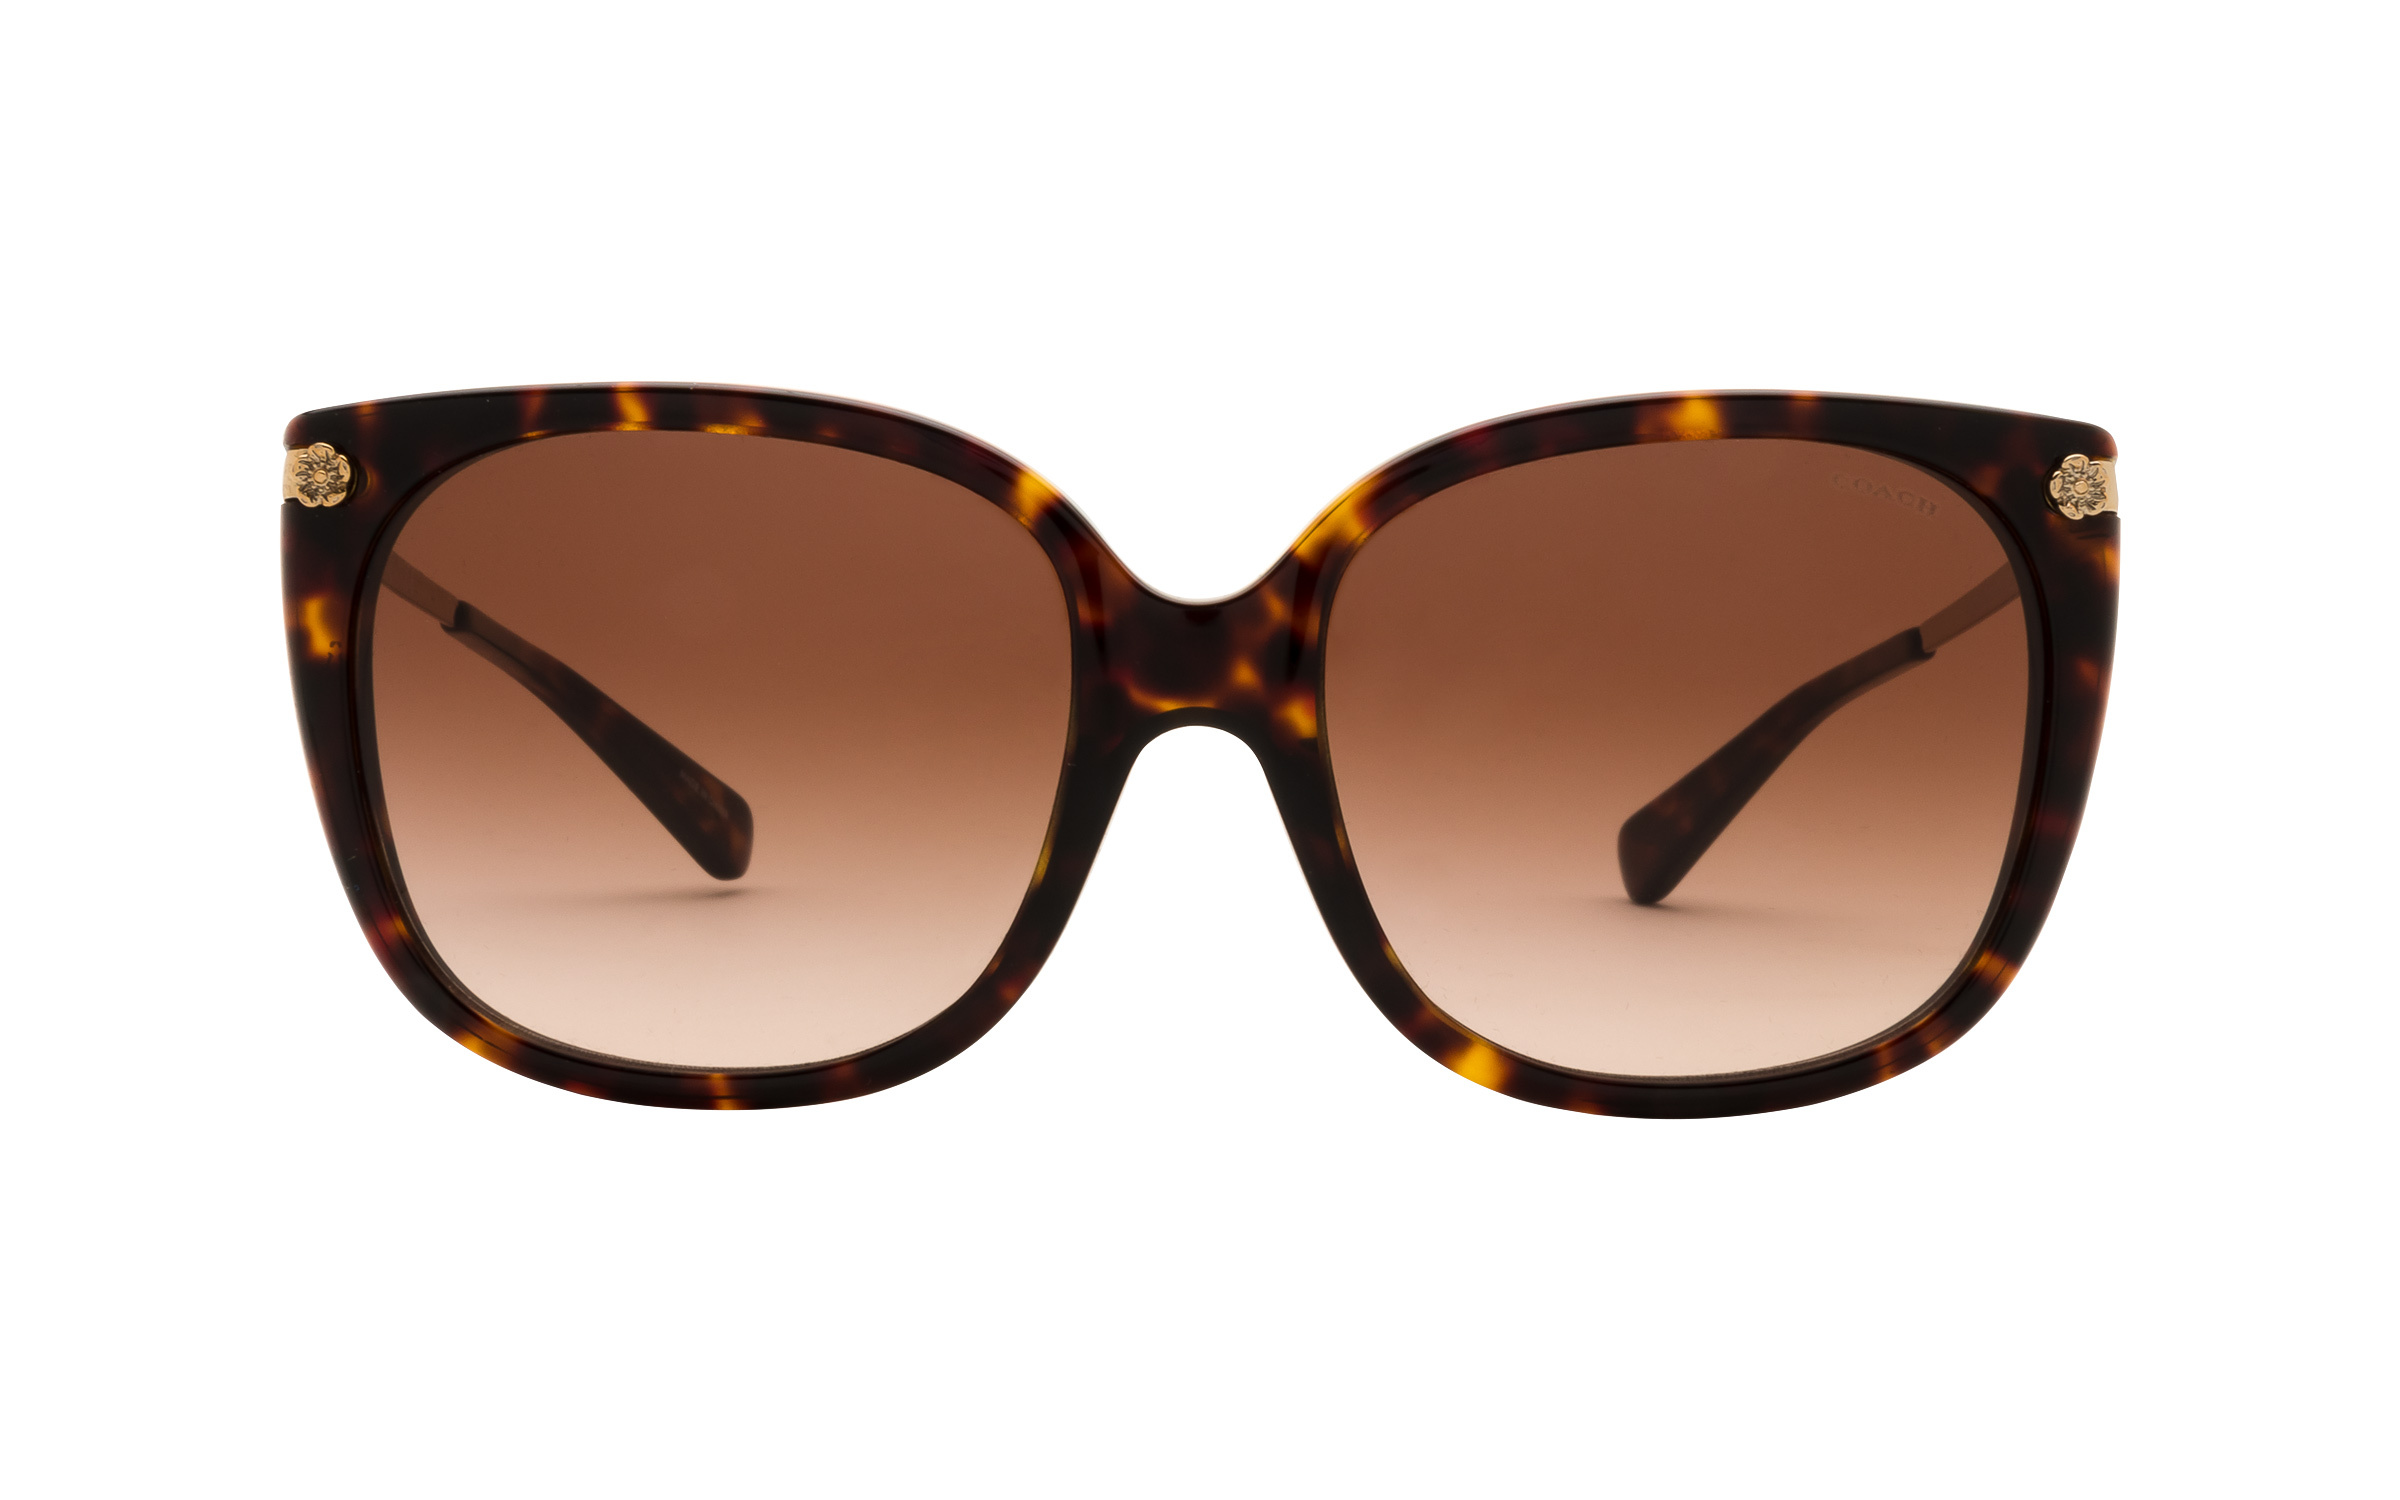 http://www.coastal.com/ - Luxottica Coach HC8272 512013 56 Sunglasses in Tortoise – Online Coastal